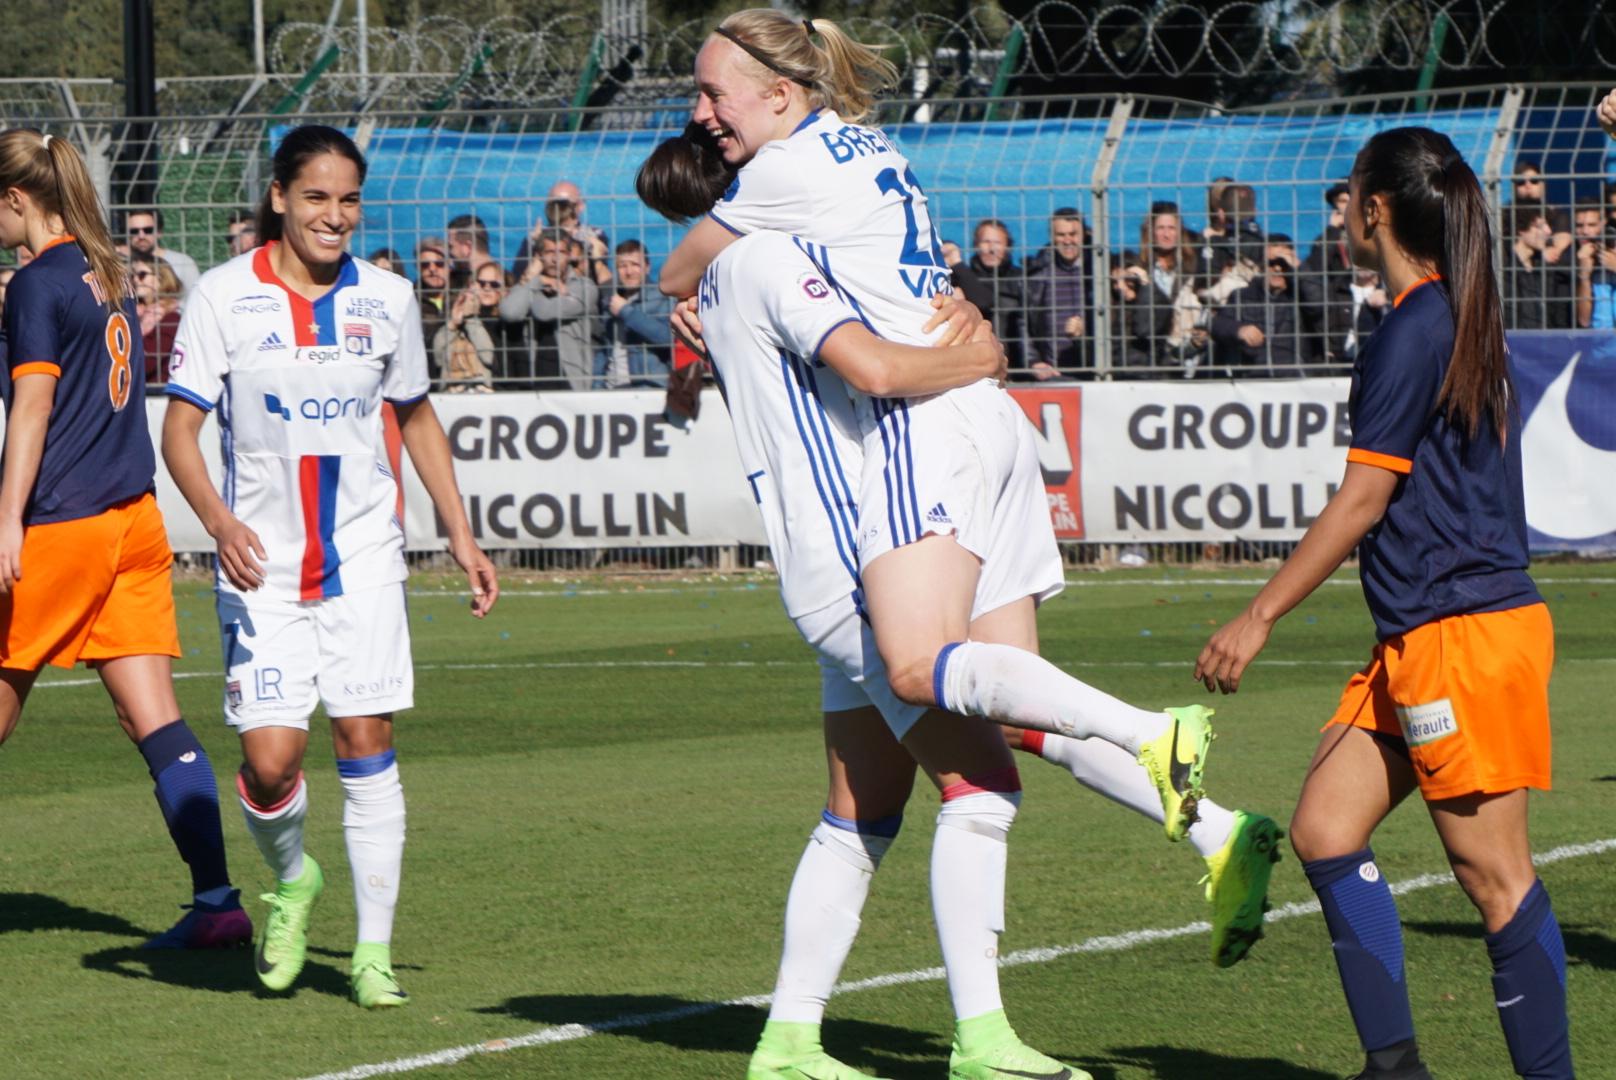 Bremer félicitée pour son but (photo footofeminin.fr)